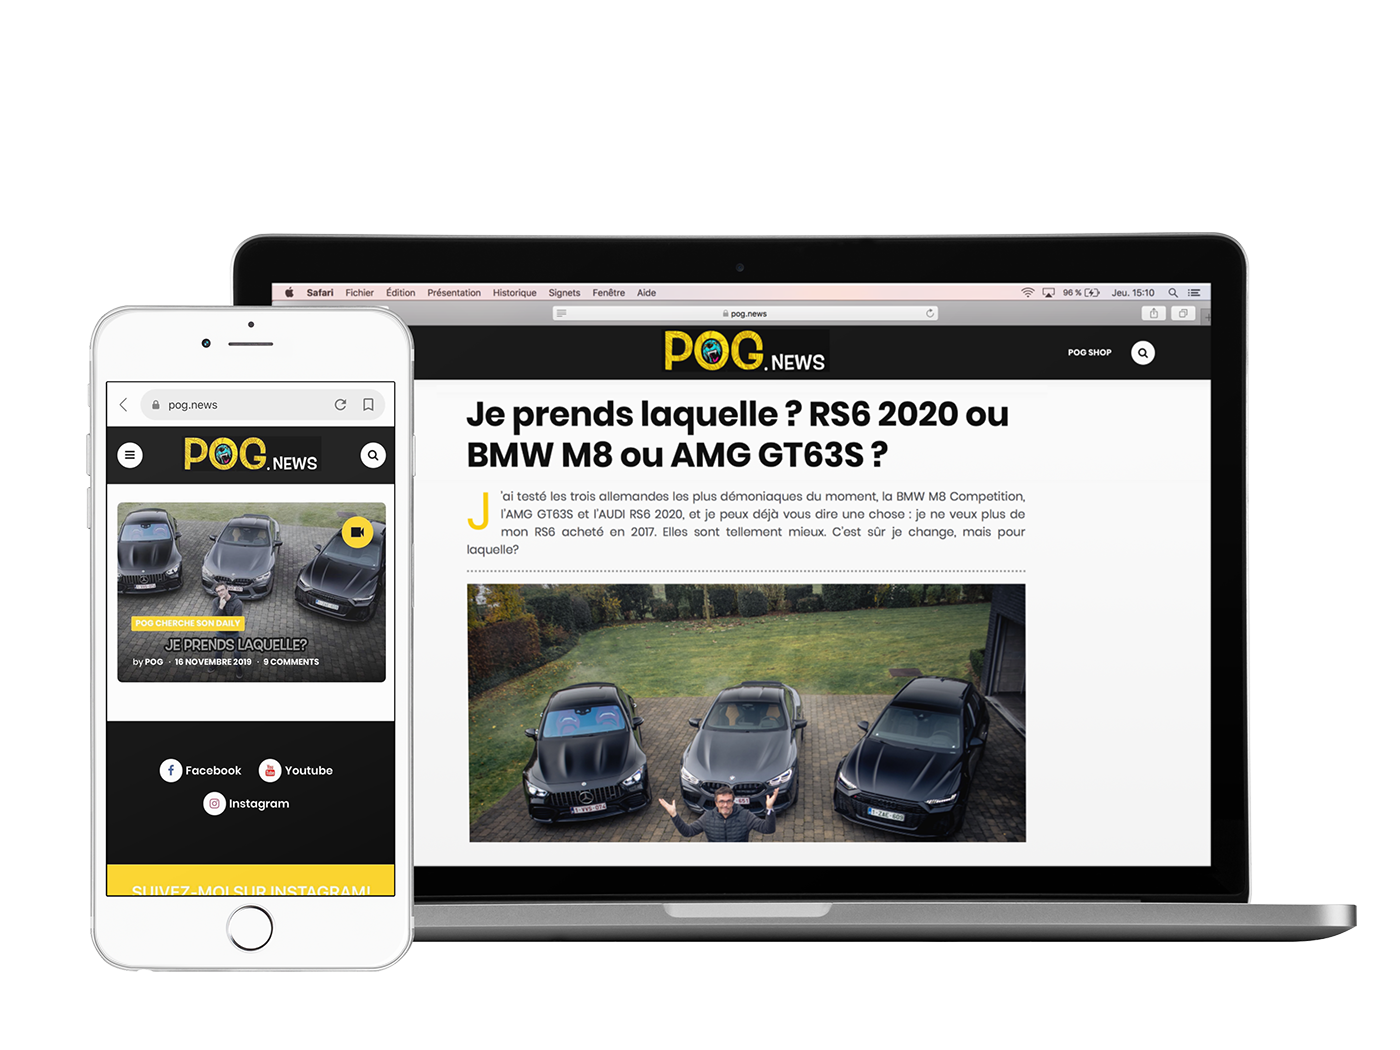 Pog news